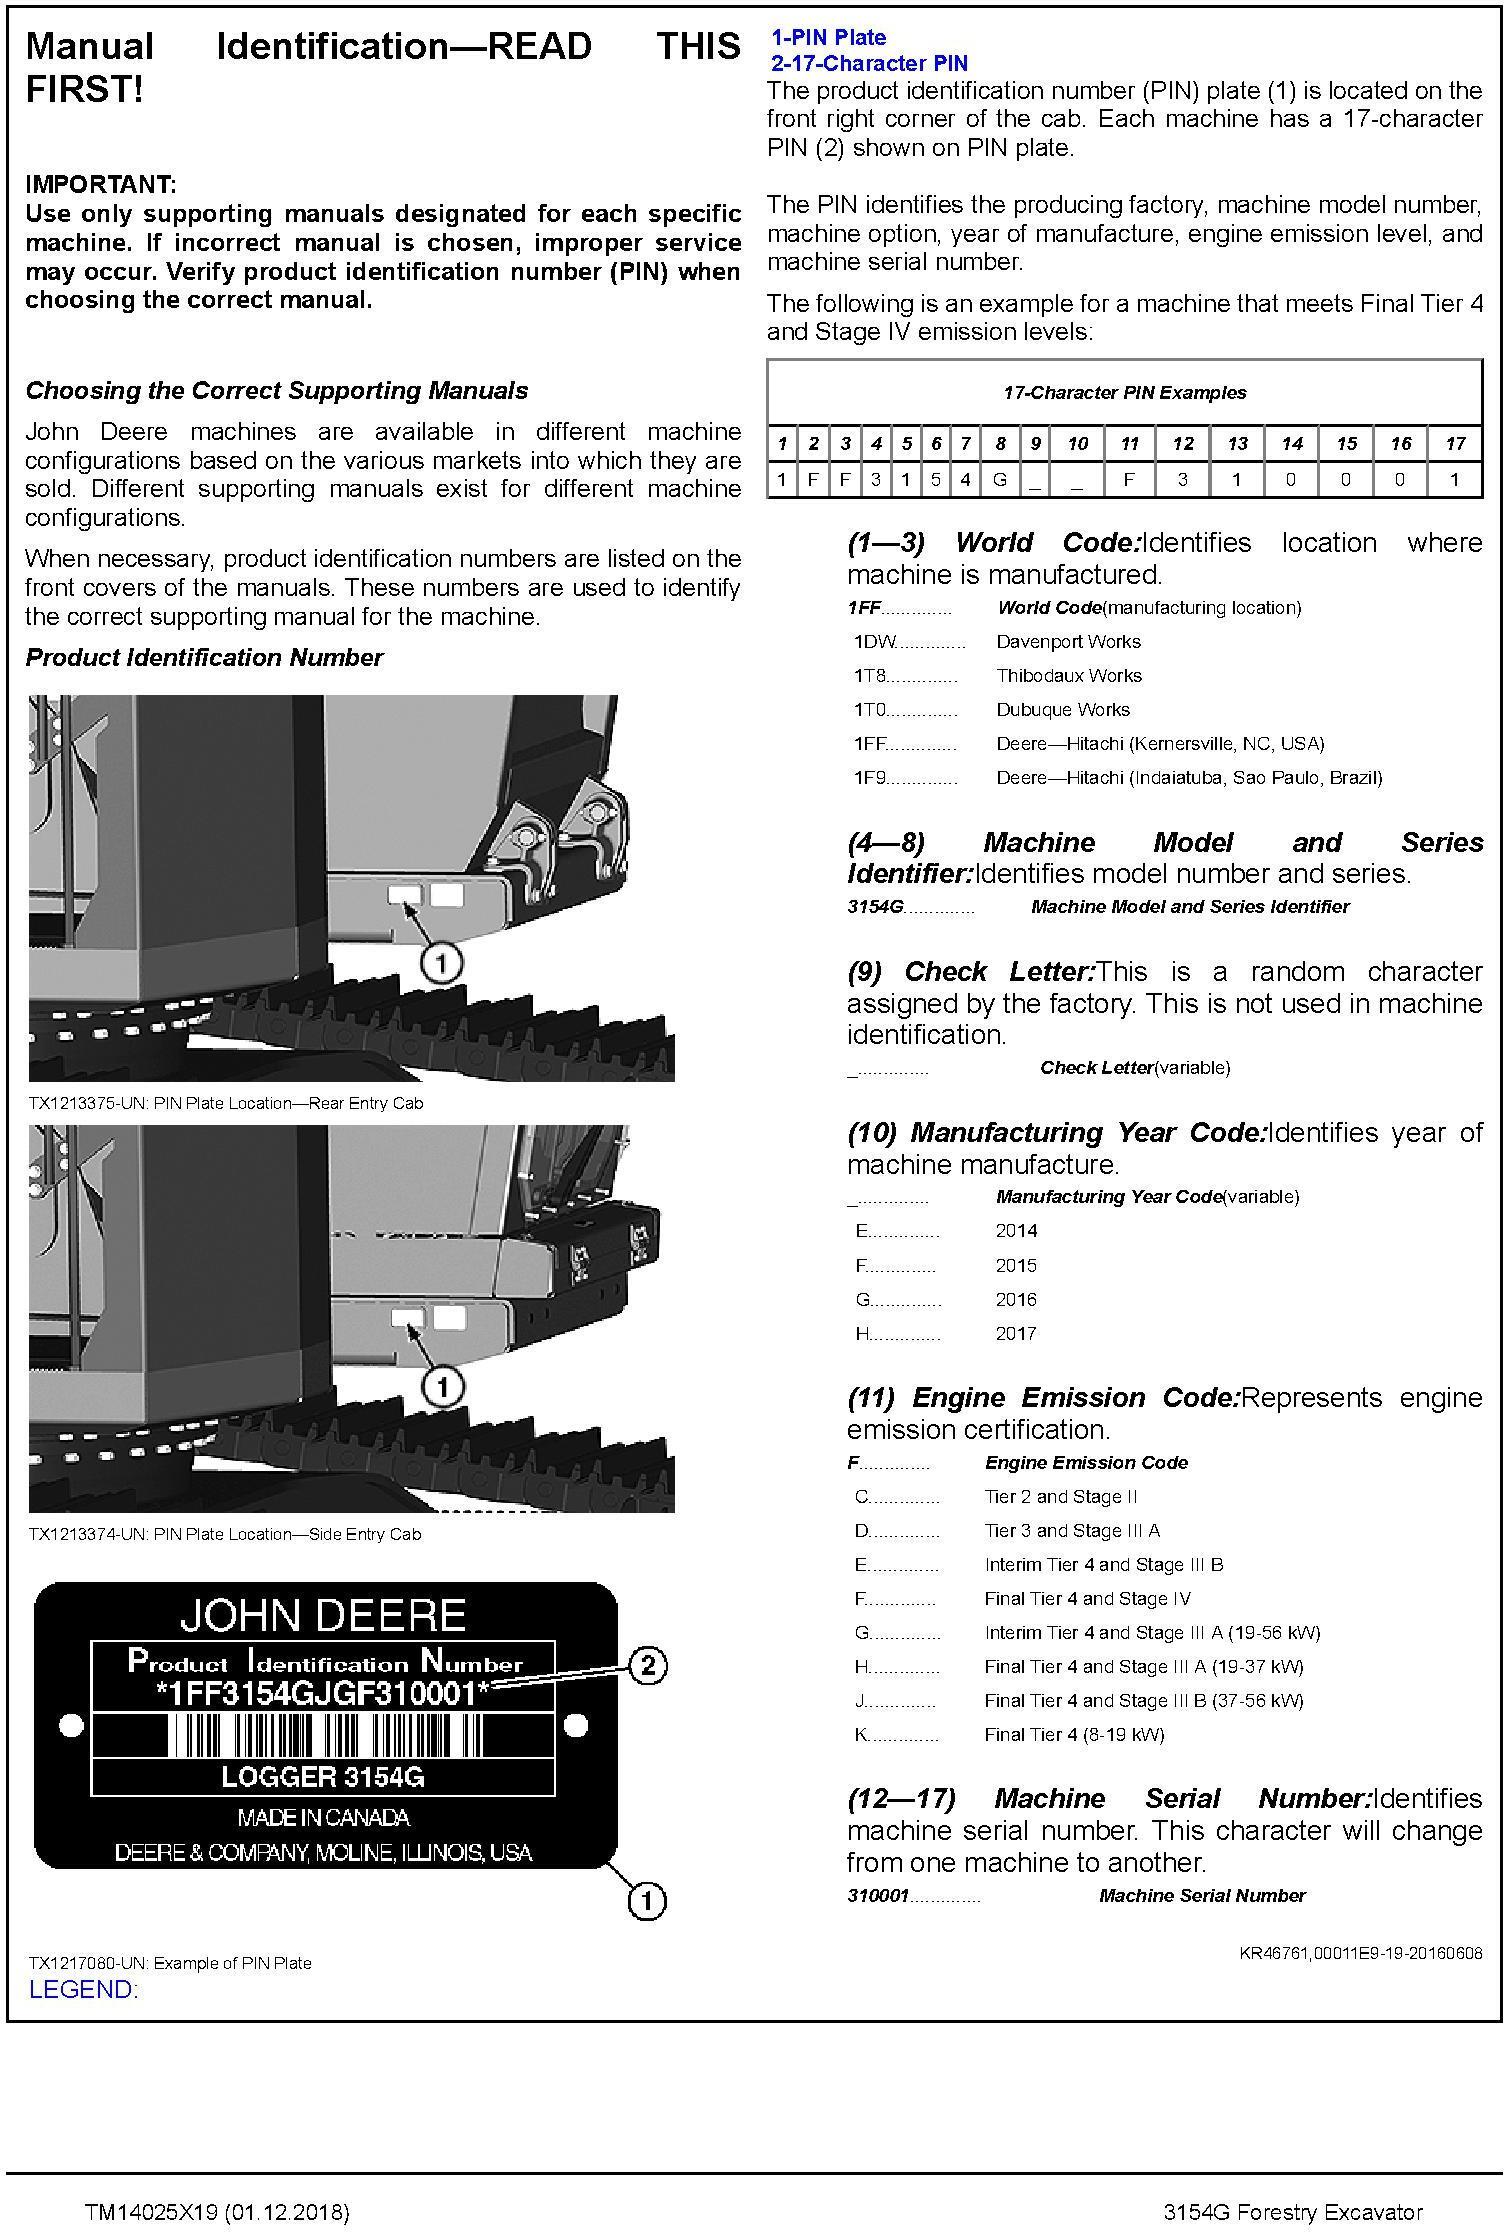 John Deere 3154G (SN. F310001-) Forestry Excavator Operation & Test Technical Manual (TM14025X19) - 1